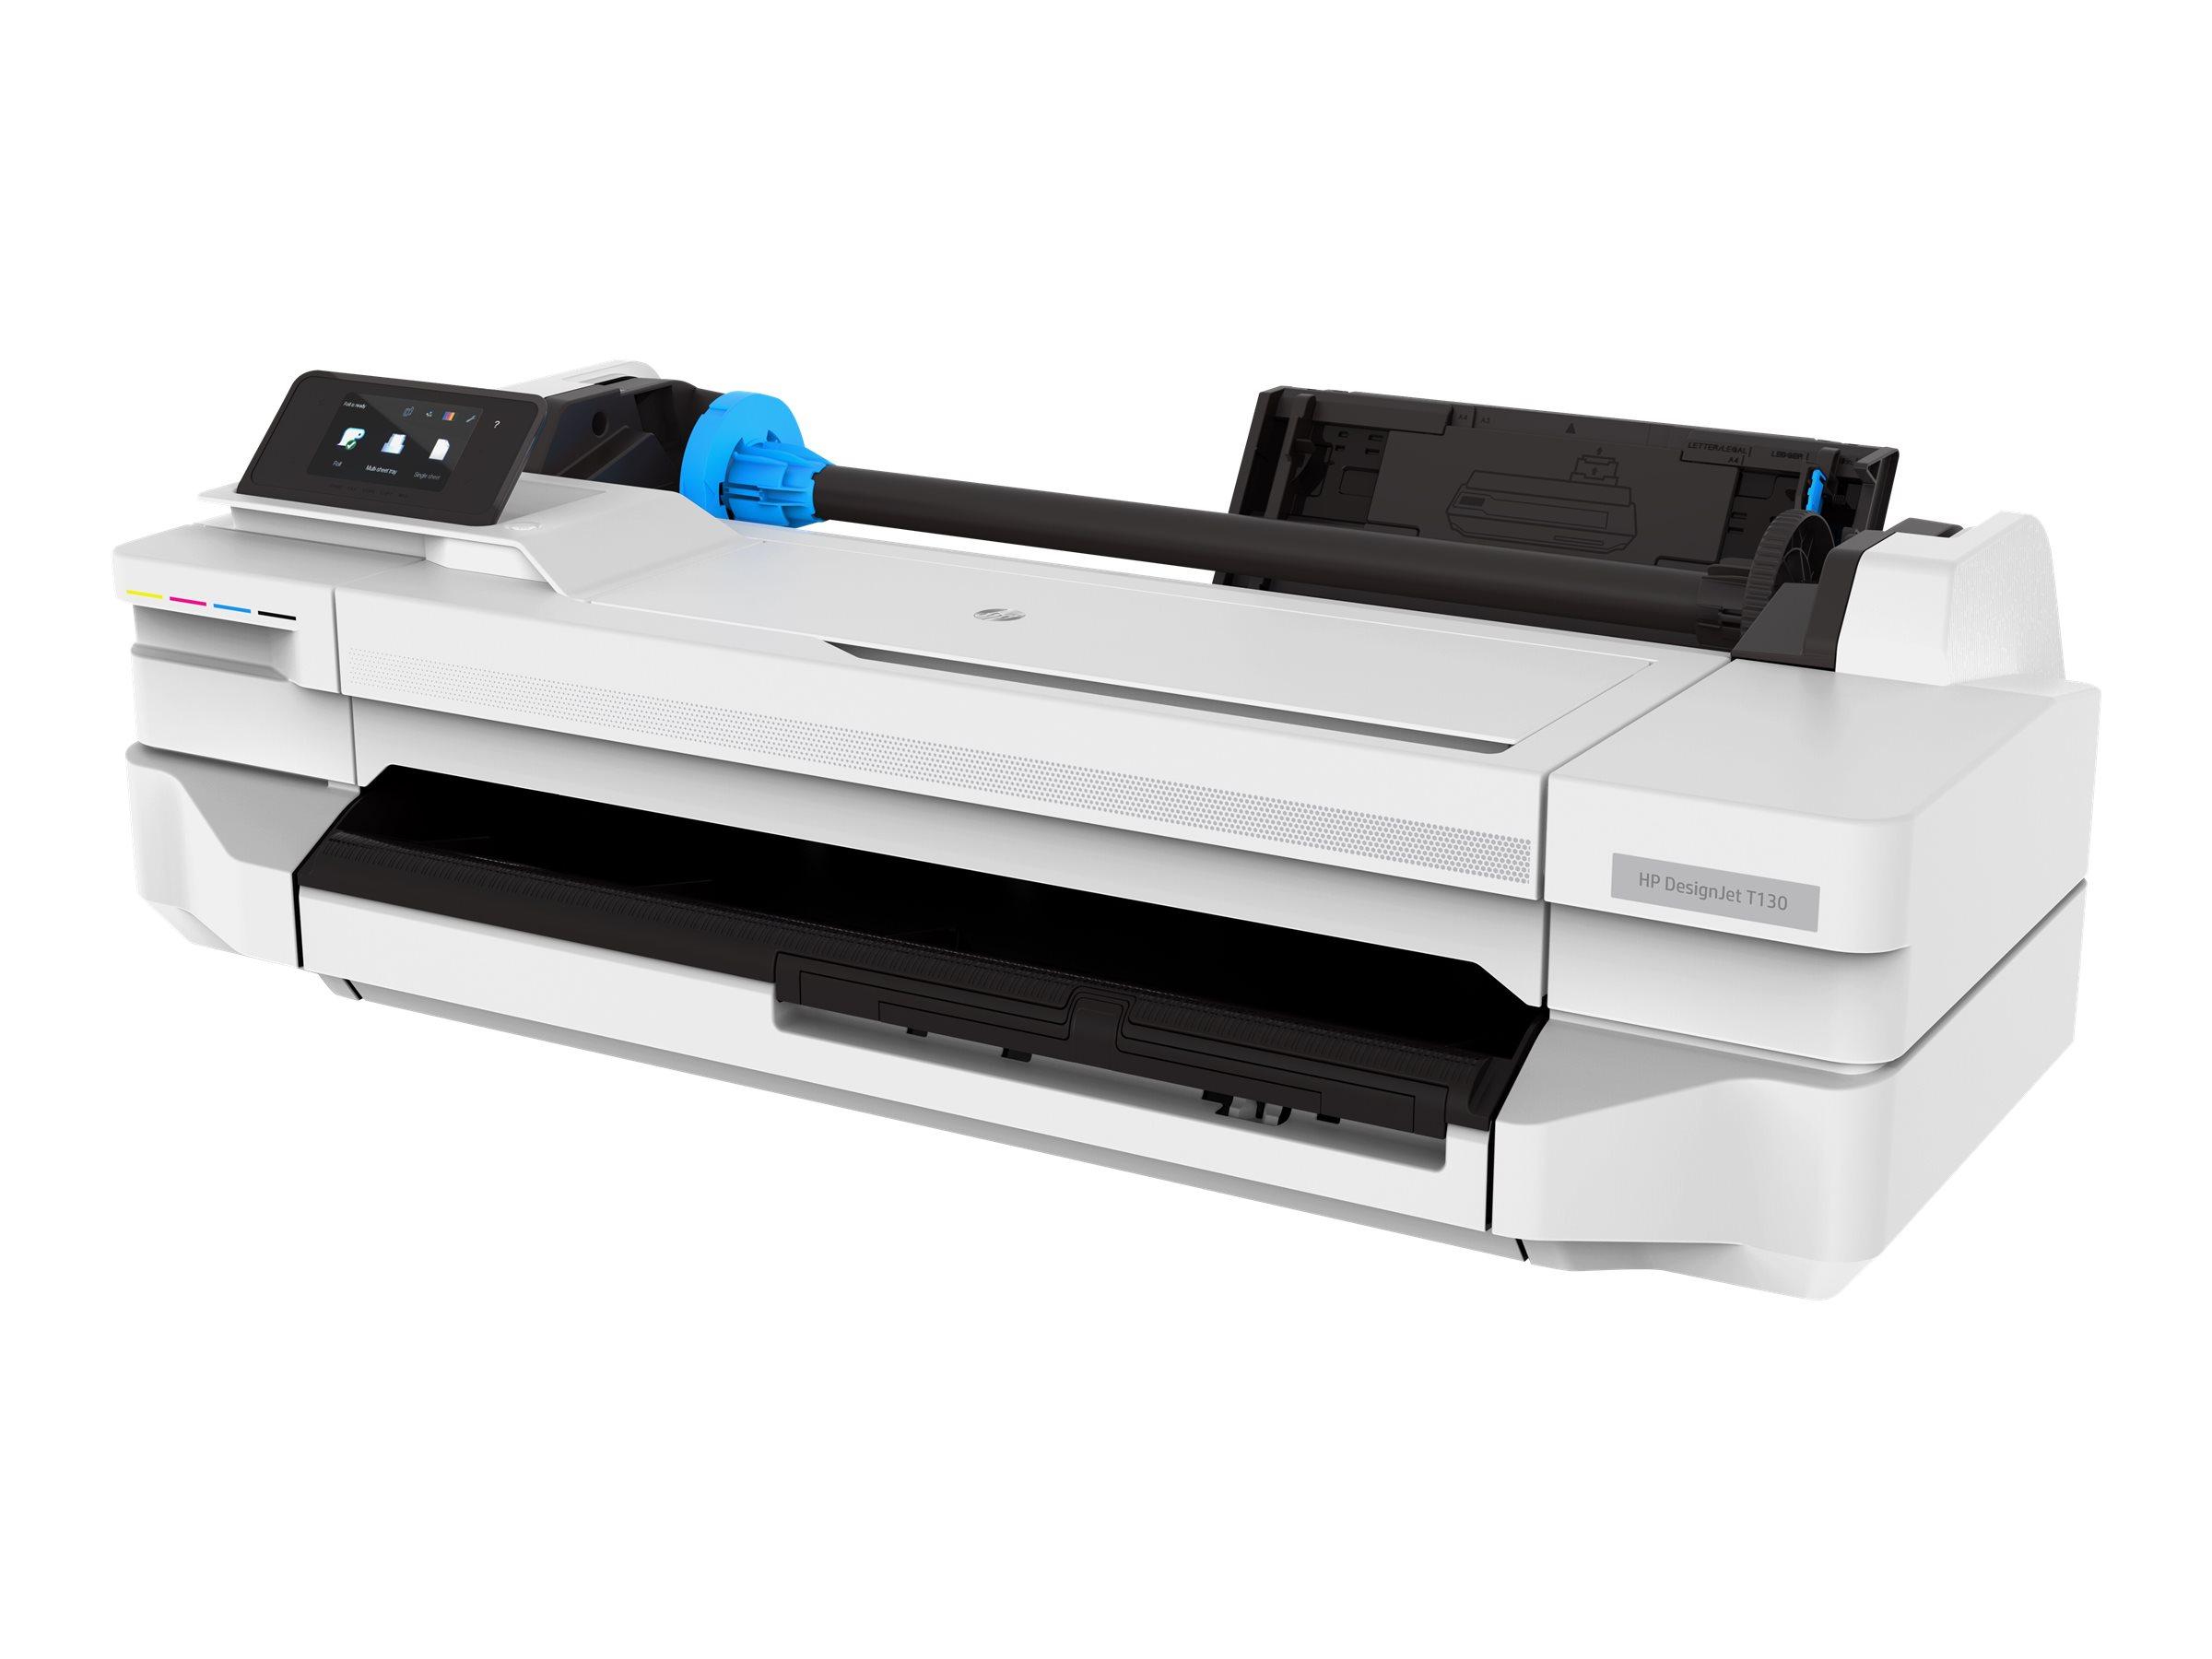 "HP DesignJet T130 - 610 mm (24"") Gro?formatdrucker - Farbe - Tintenstrahl - Rolle A1 (61,0 cm x 45,7 m)"